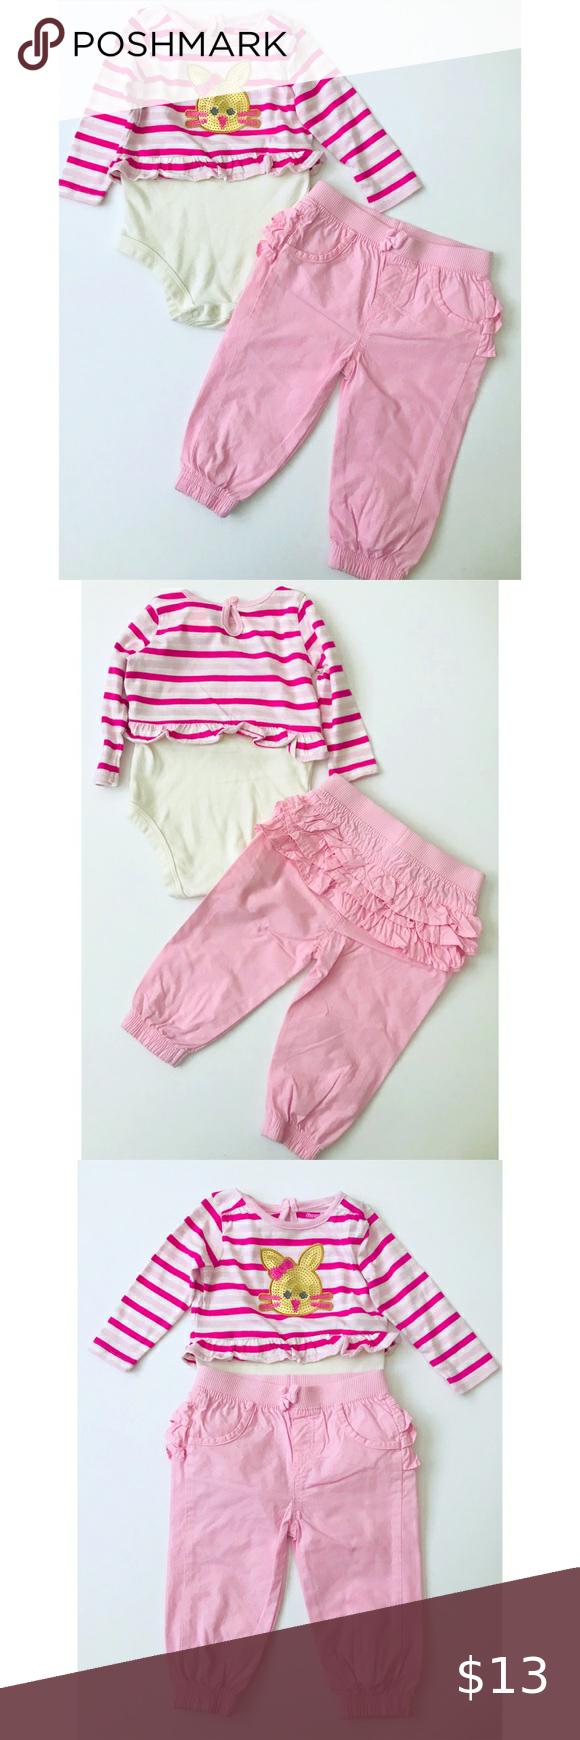 Pink White Striped Onesie W Pink Pants Pink White Pink Pants White Stripe